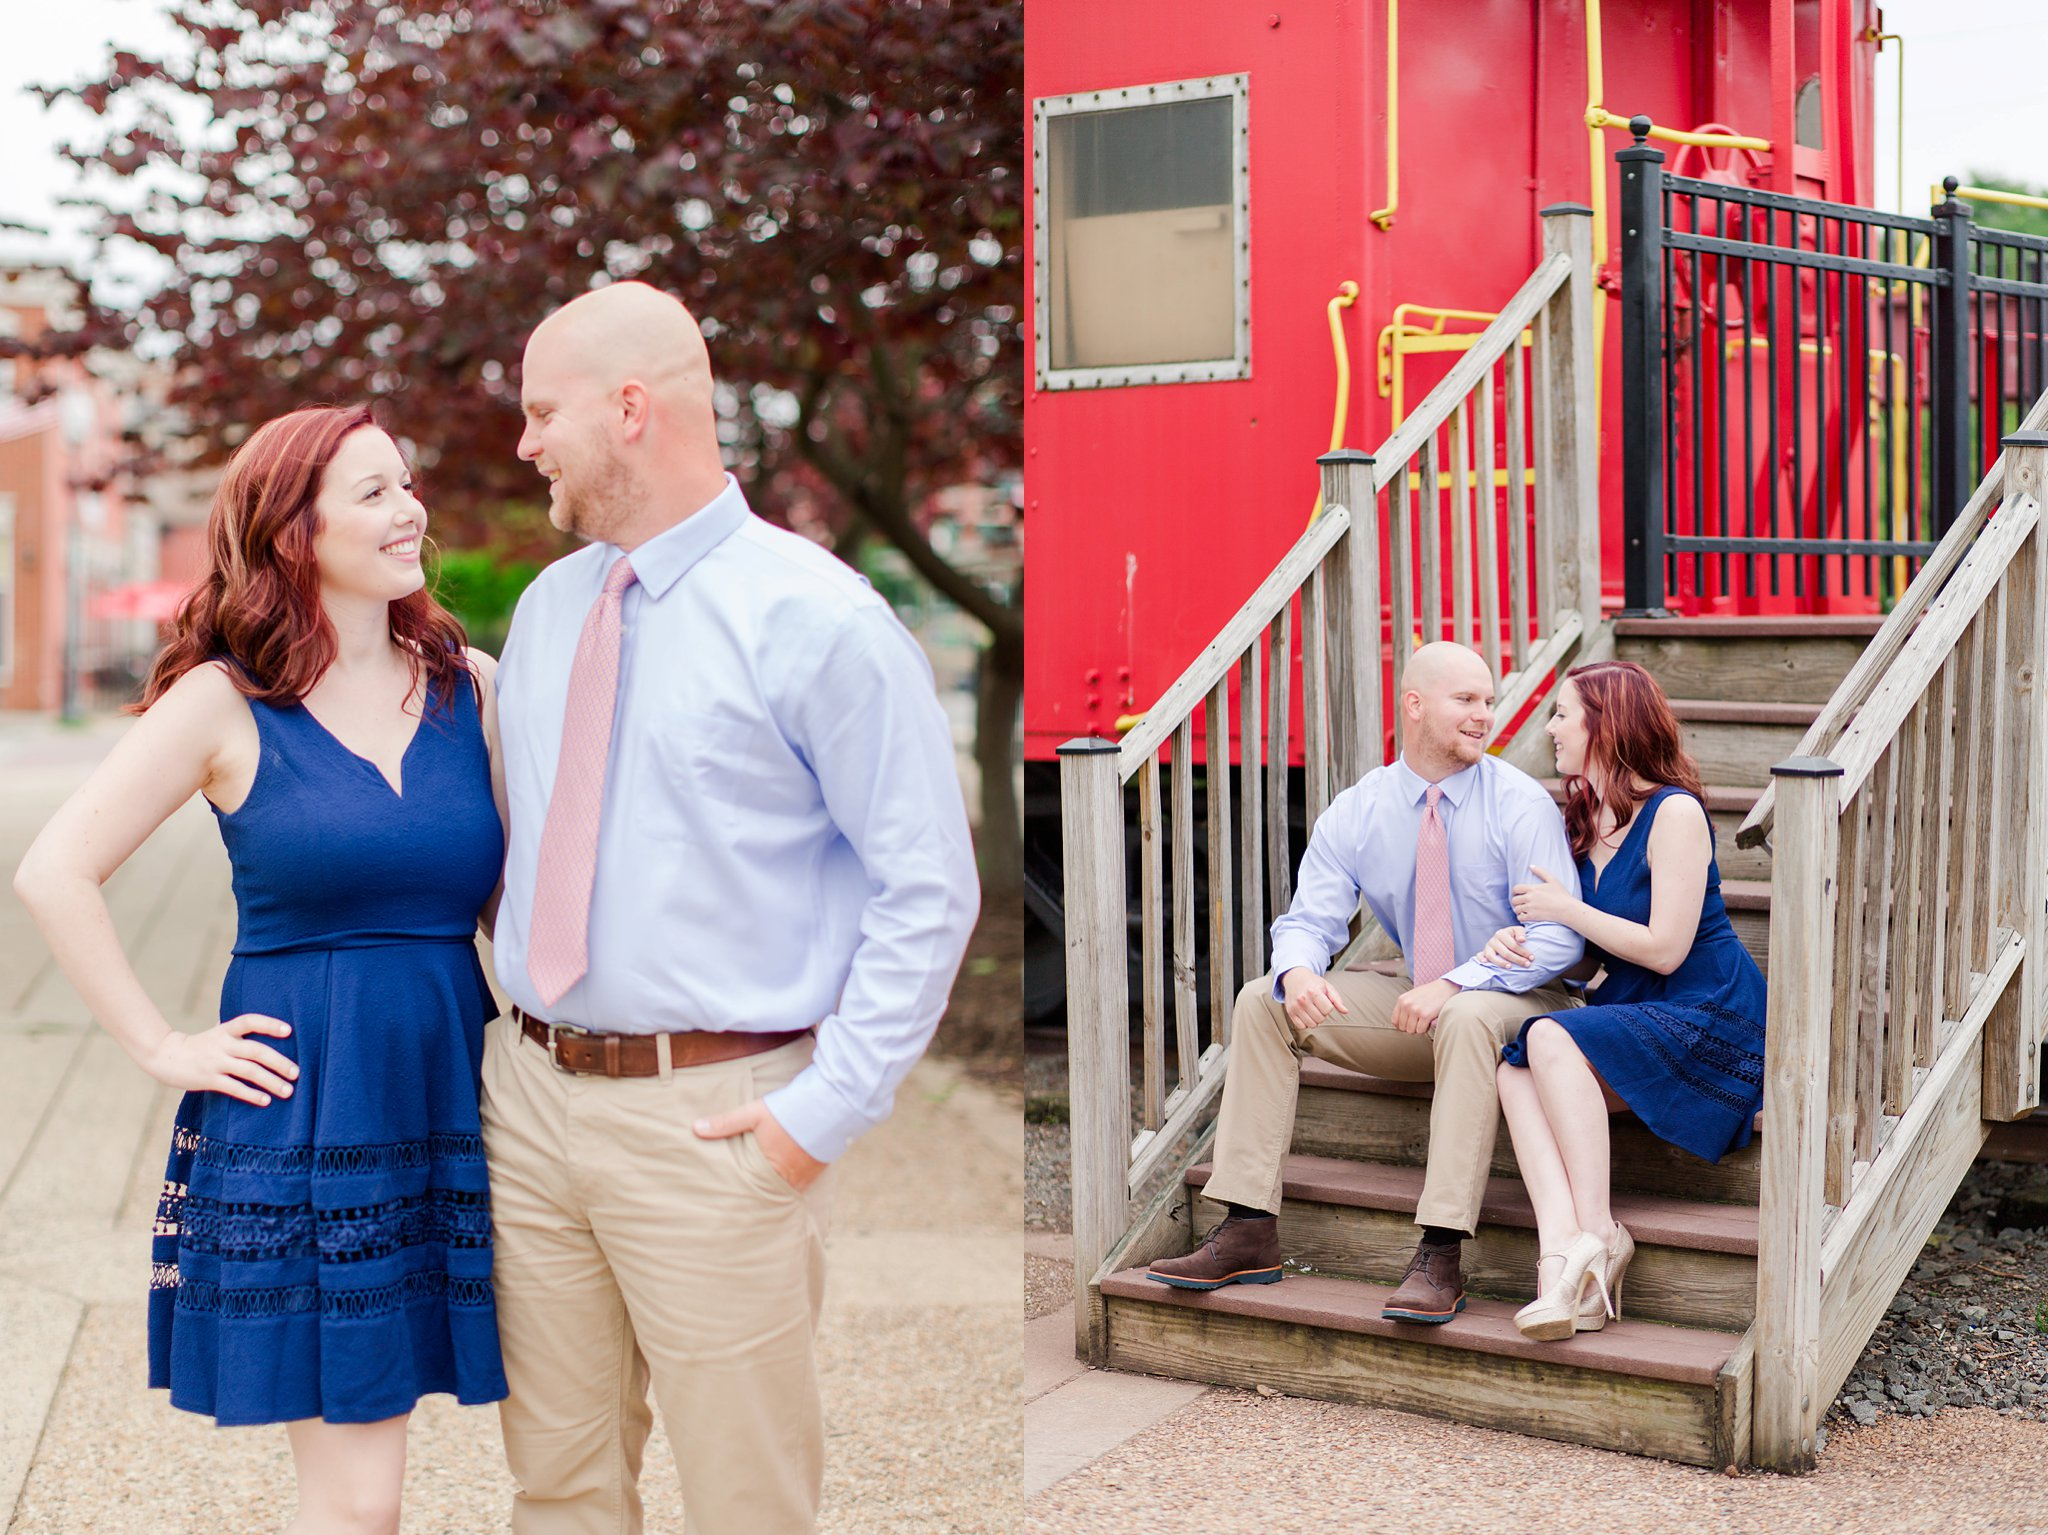 Old Town Manassas Battlefield Engagement Photos Virginia Wedding Photographer Jessica & Jason-3.jpg